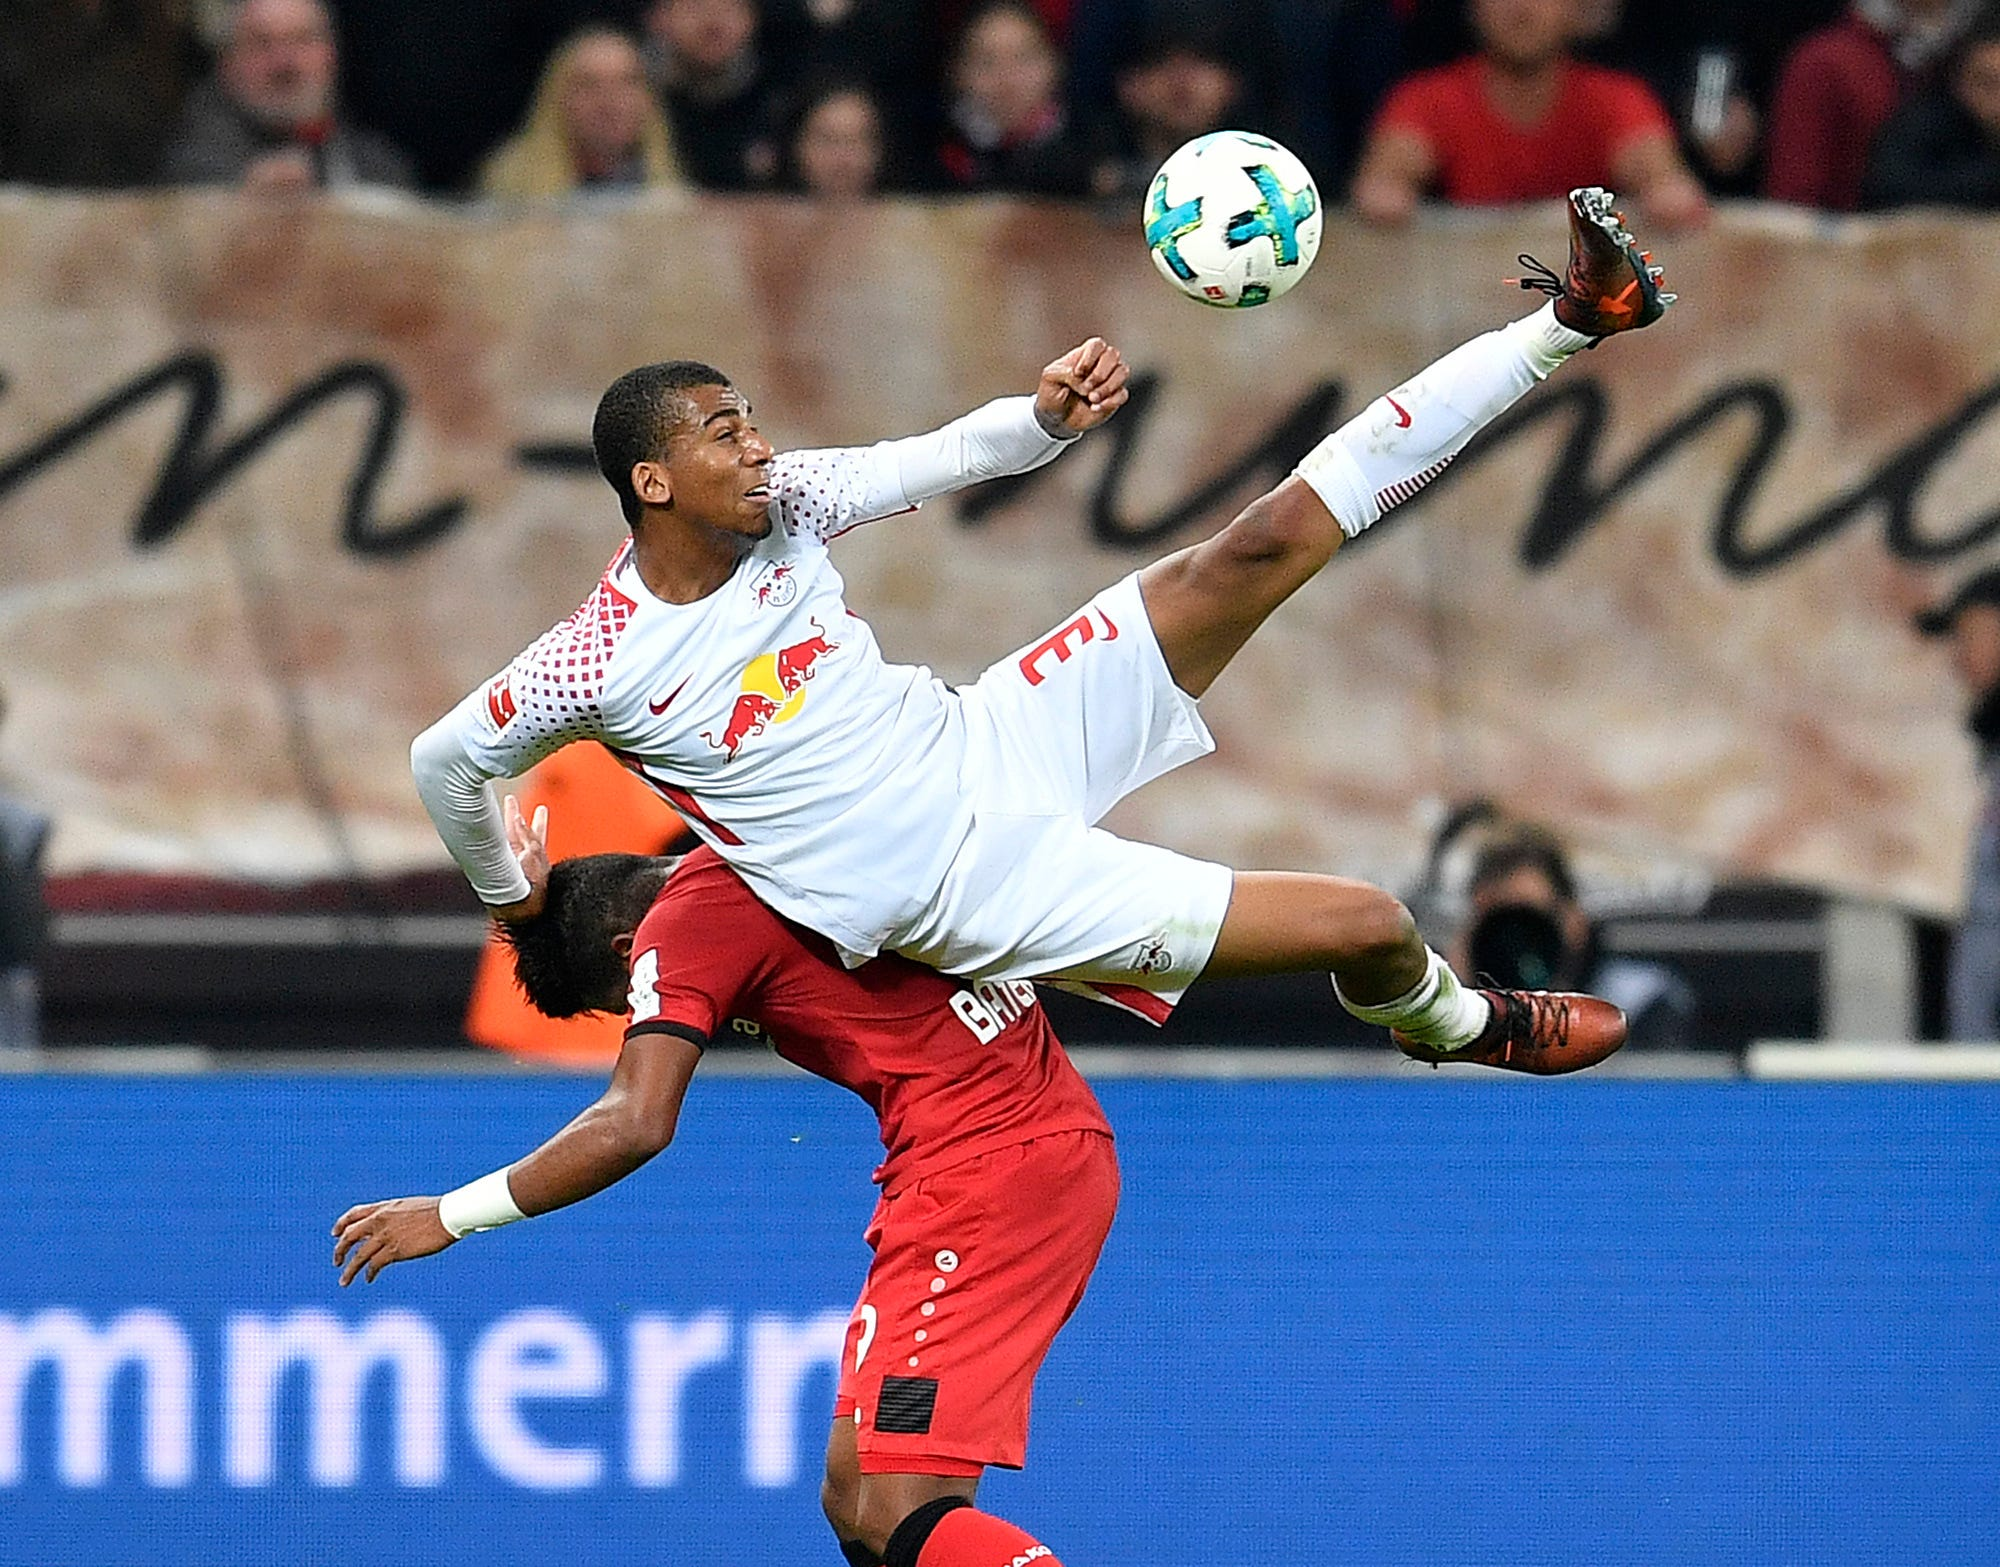 Bayern leads Bundesliga by 6 points as Heynckes wins again